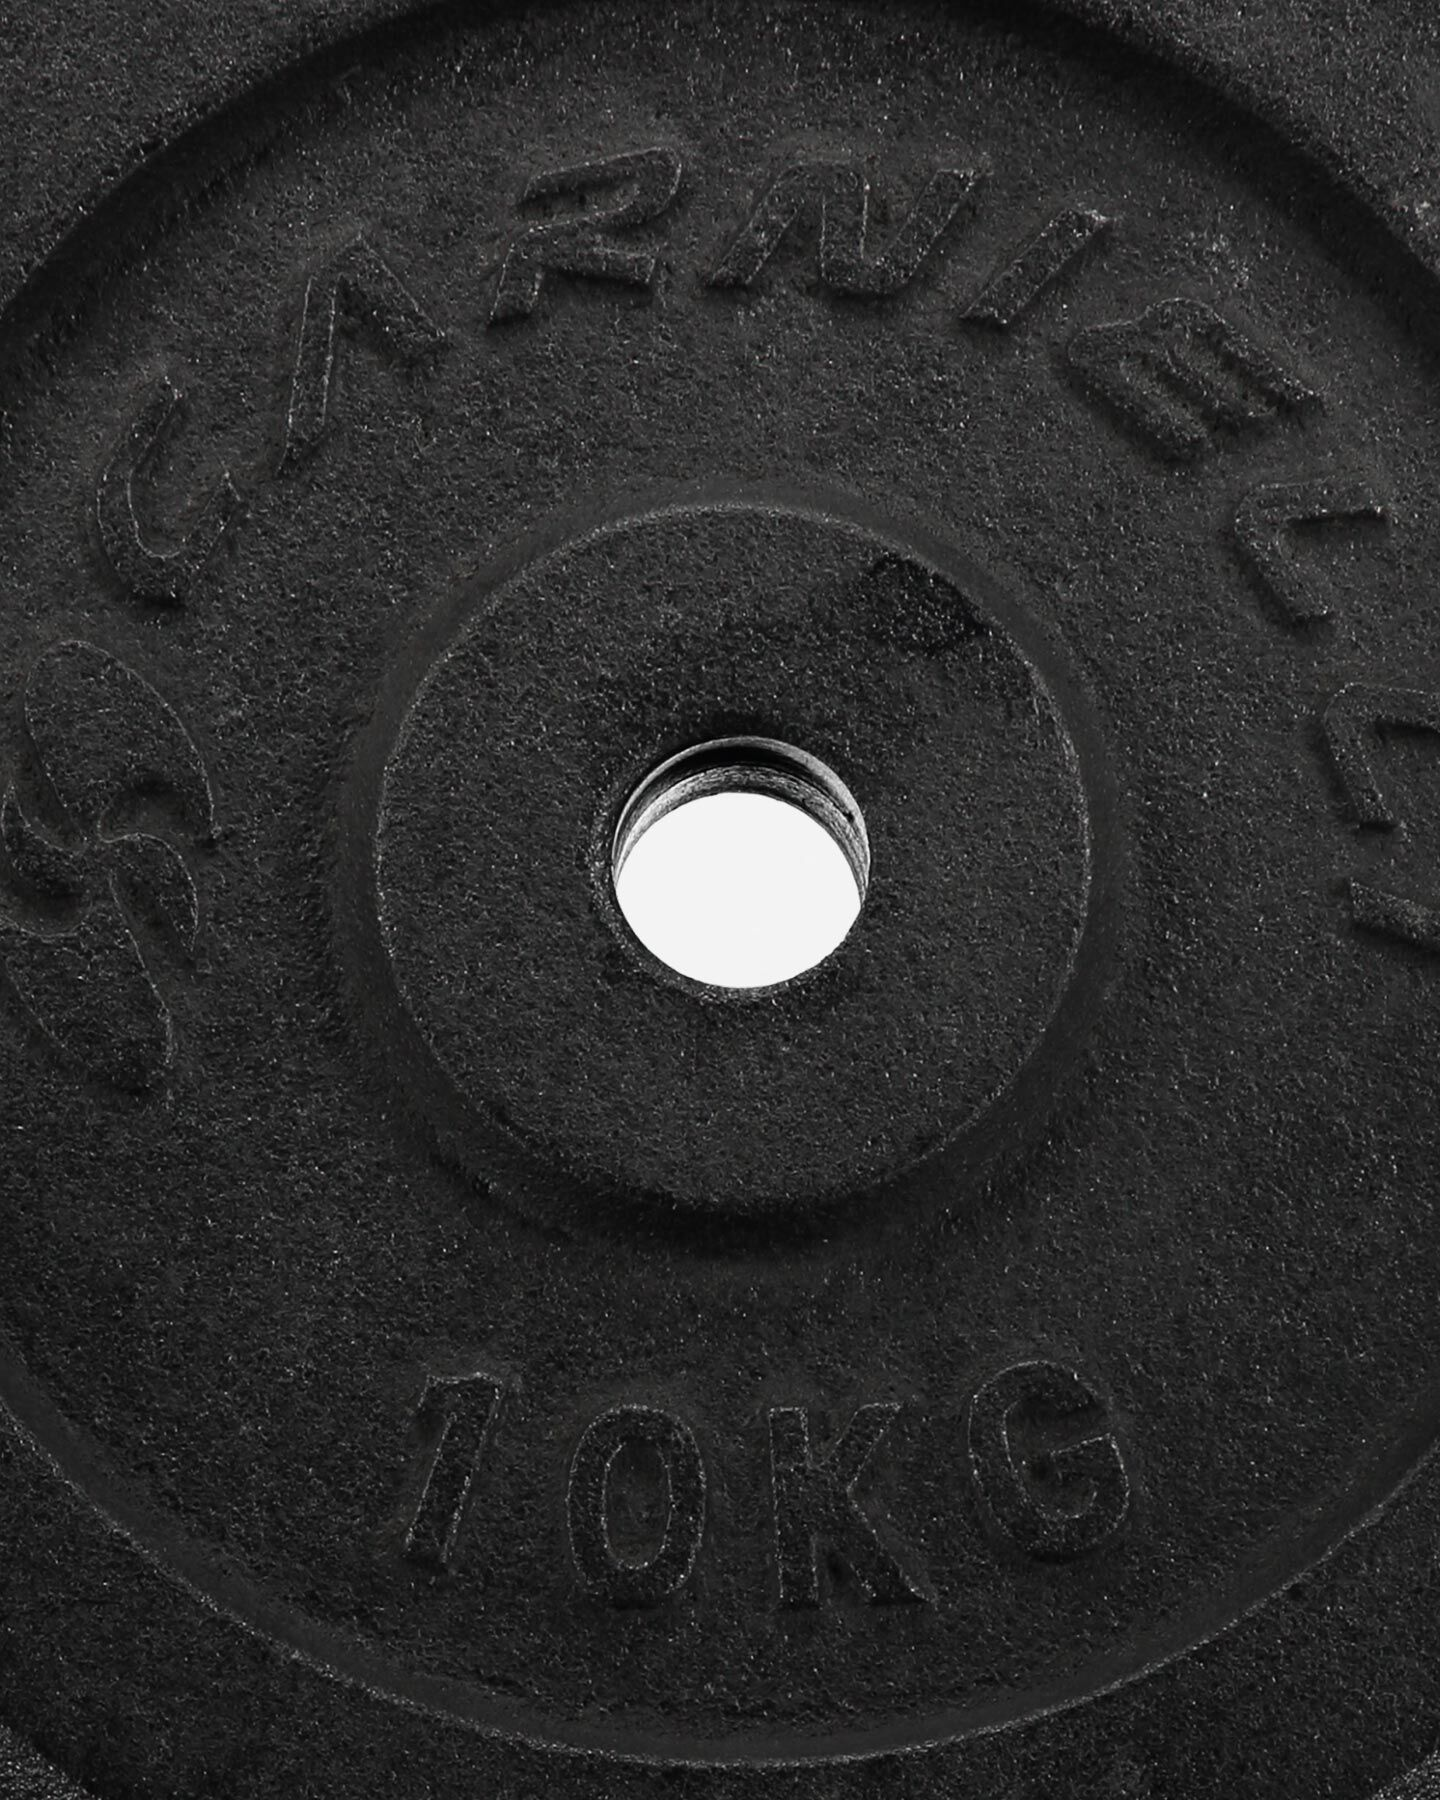 Disco ghisa CARNIELLI DISCO 10 KG S0223760|9999|UNI scatto 1